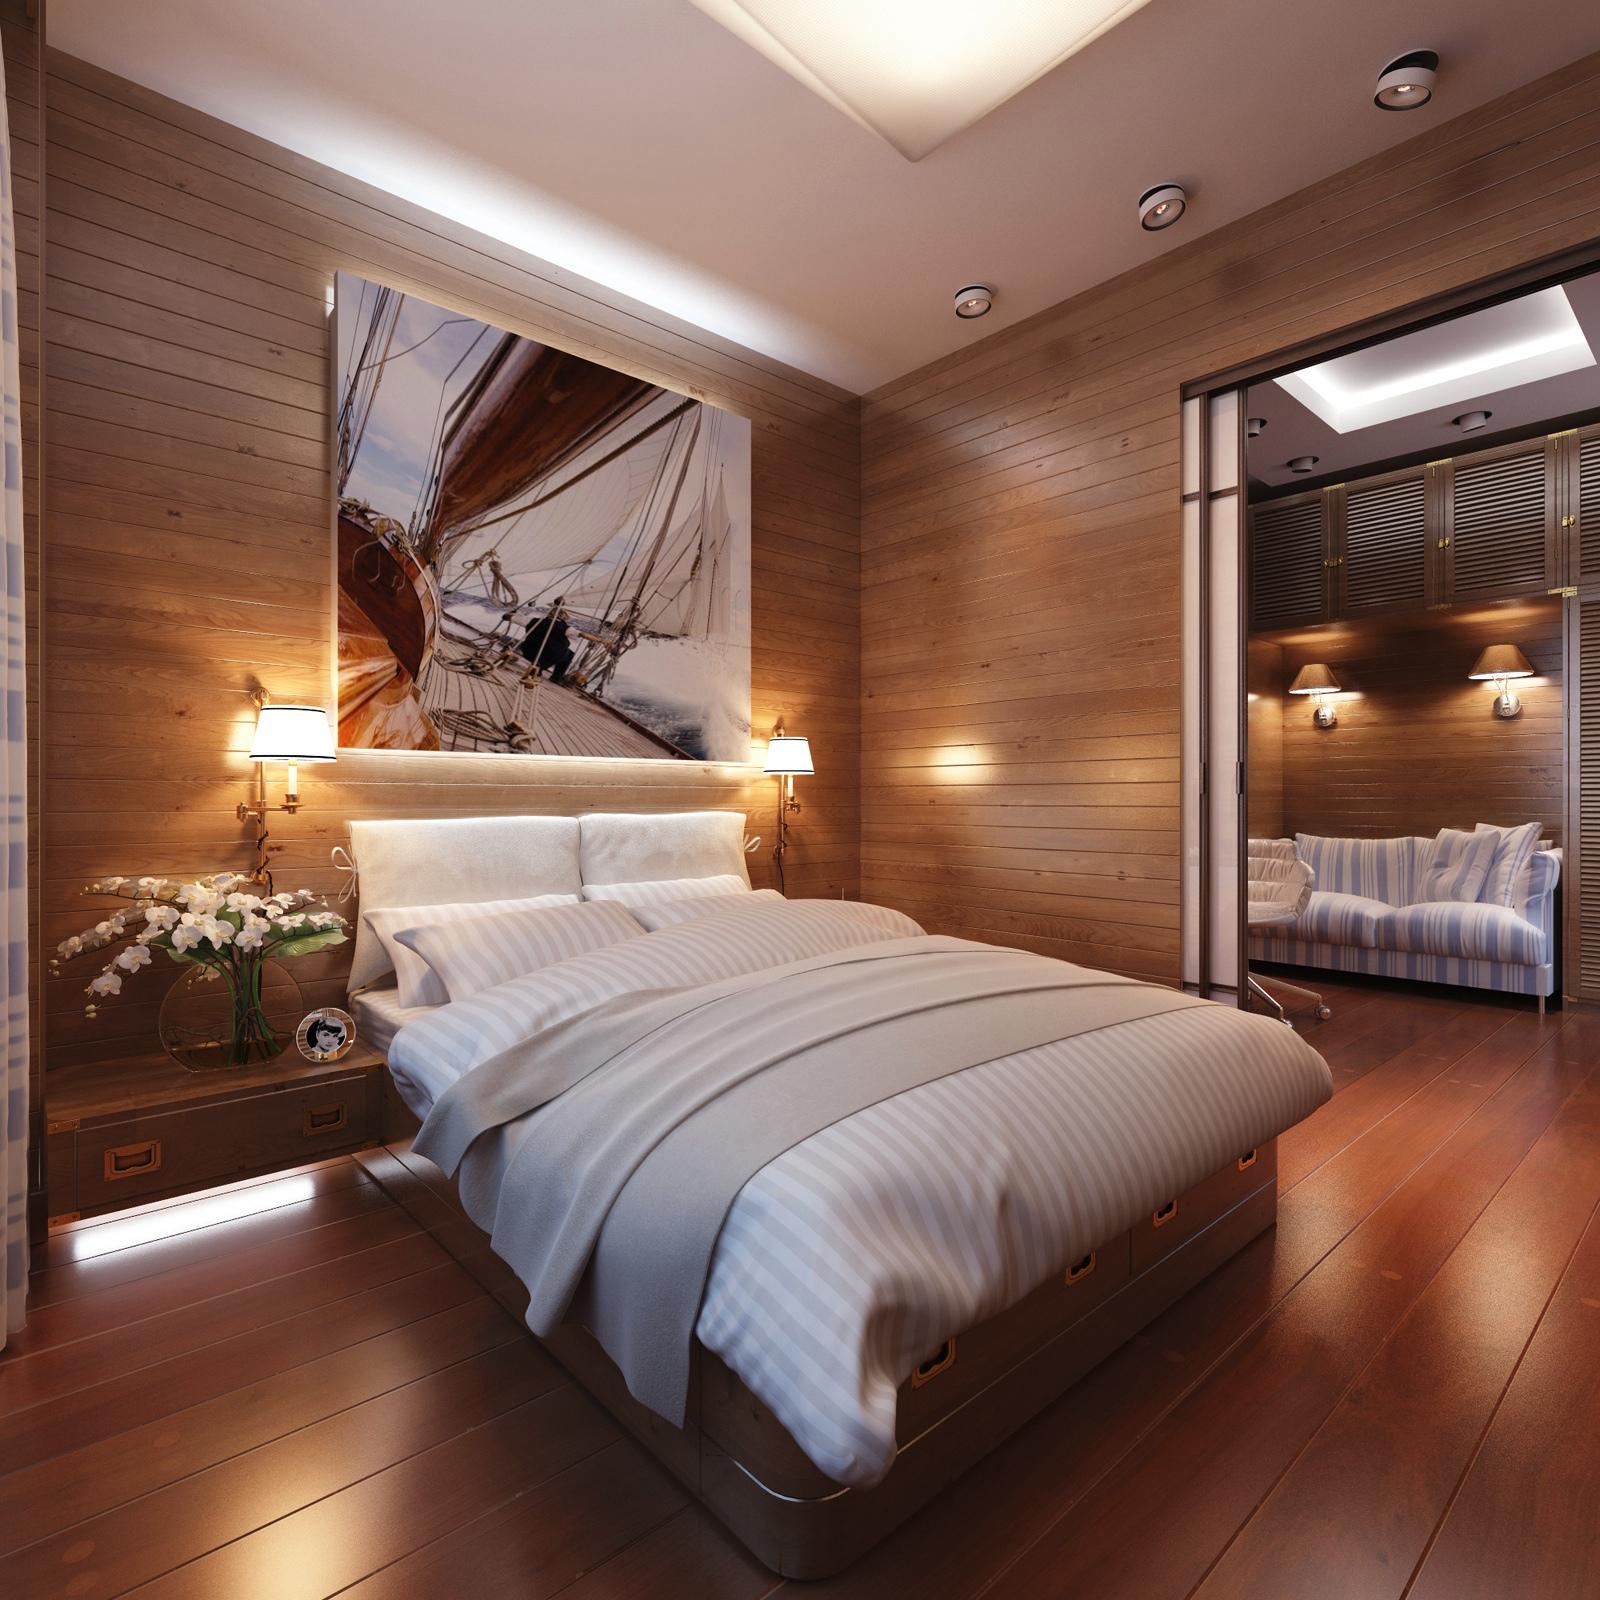 Cabin Style Bedroom Decor